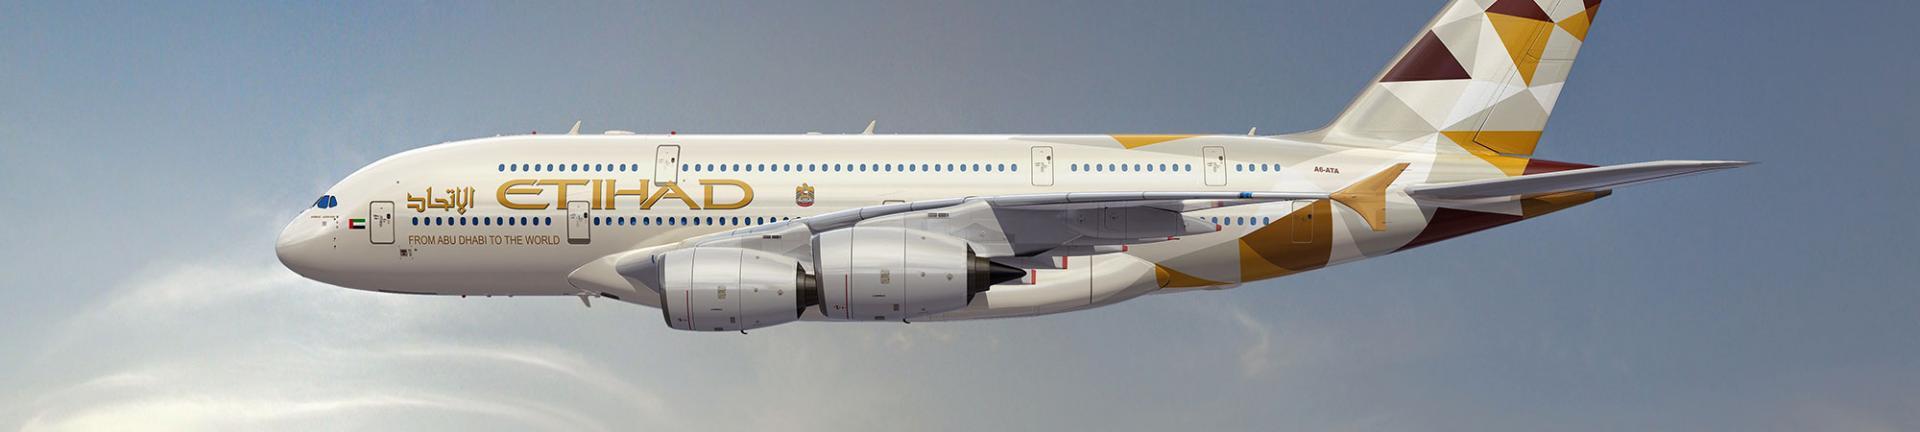 Etihad A380 plane in the sky